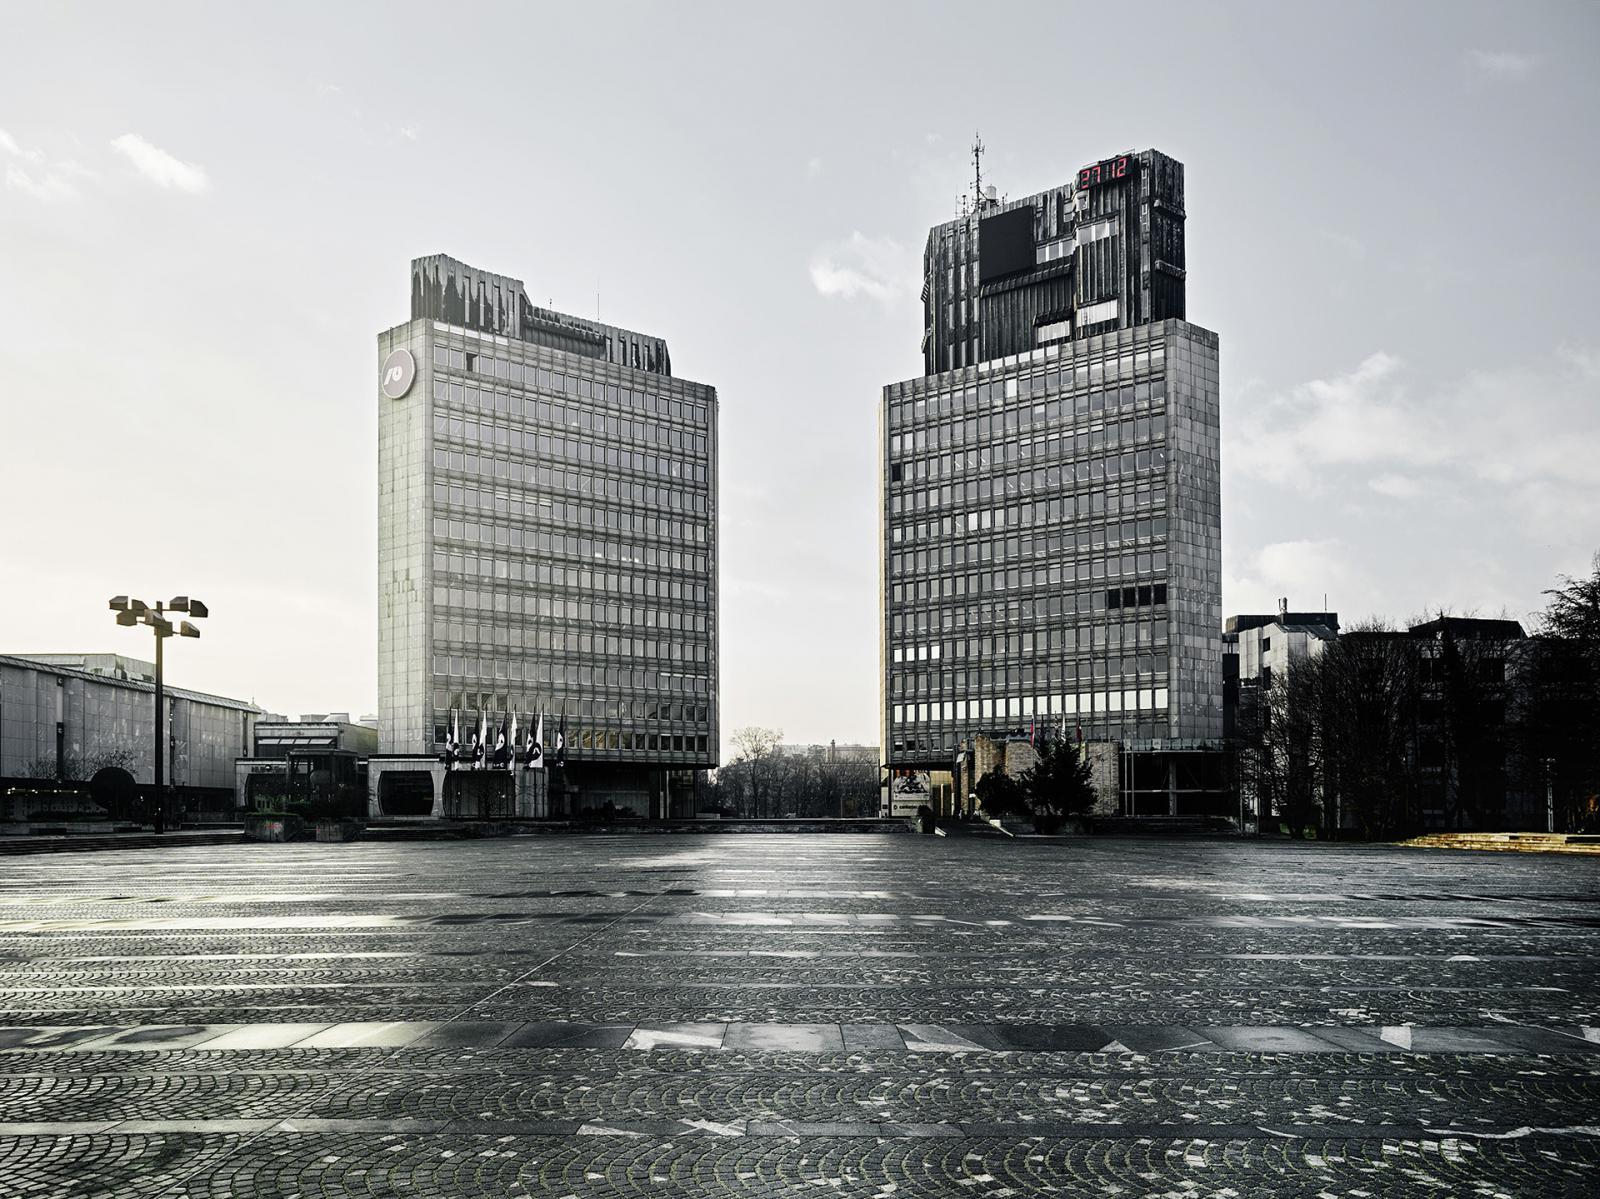 Архитектура Югославии: от Белграда до Нью-Йорка